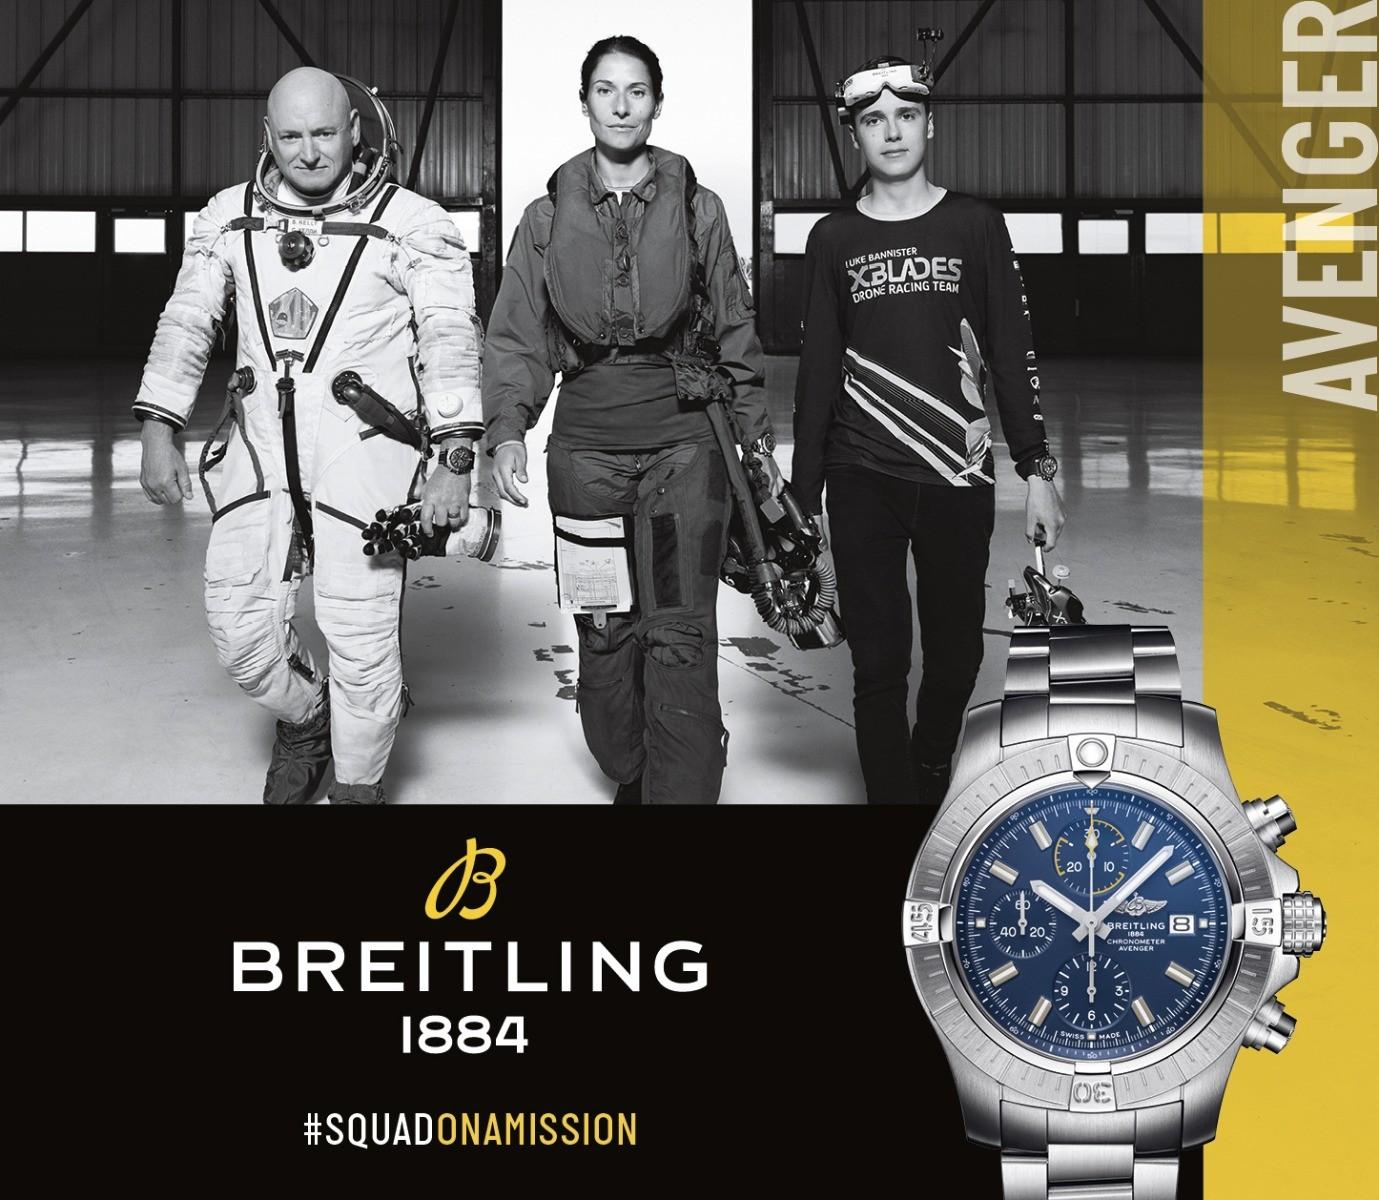 Breitling #squadonamission 3 people